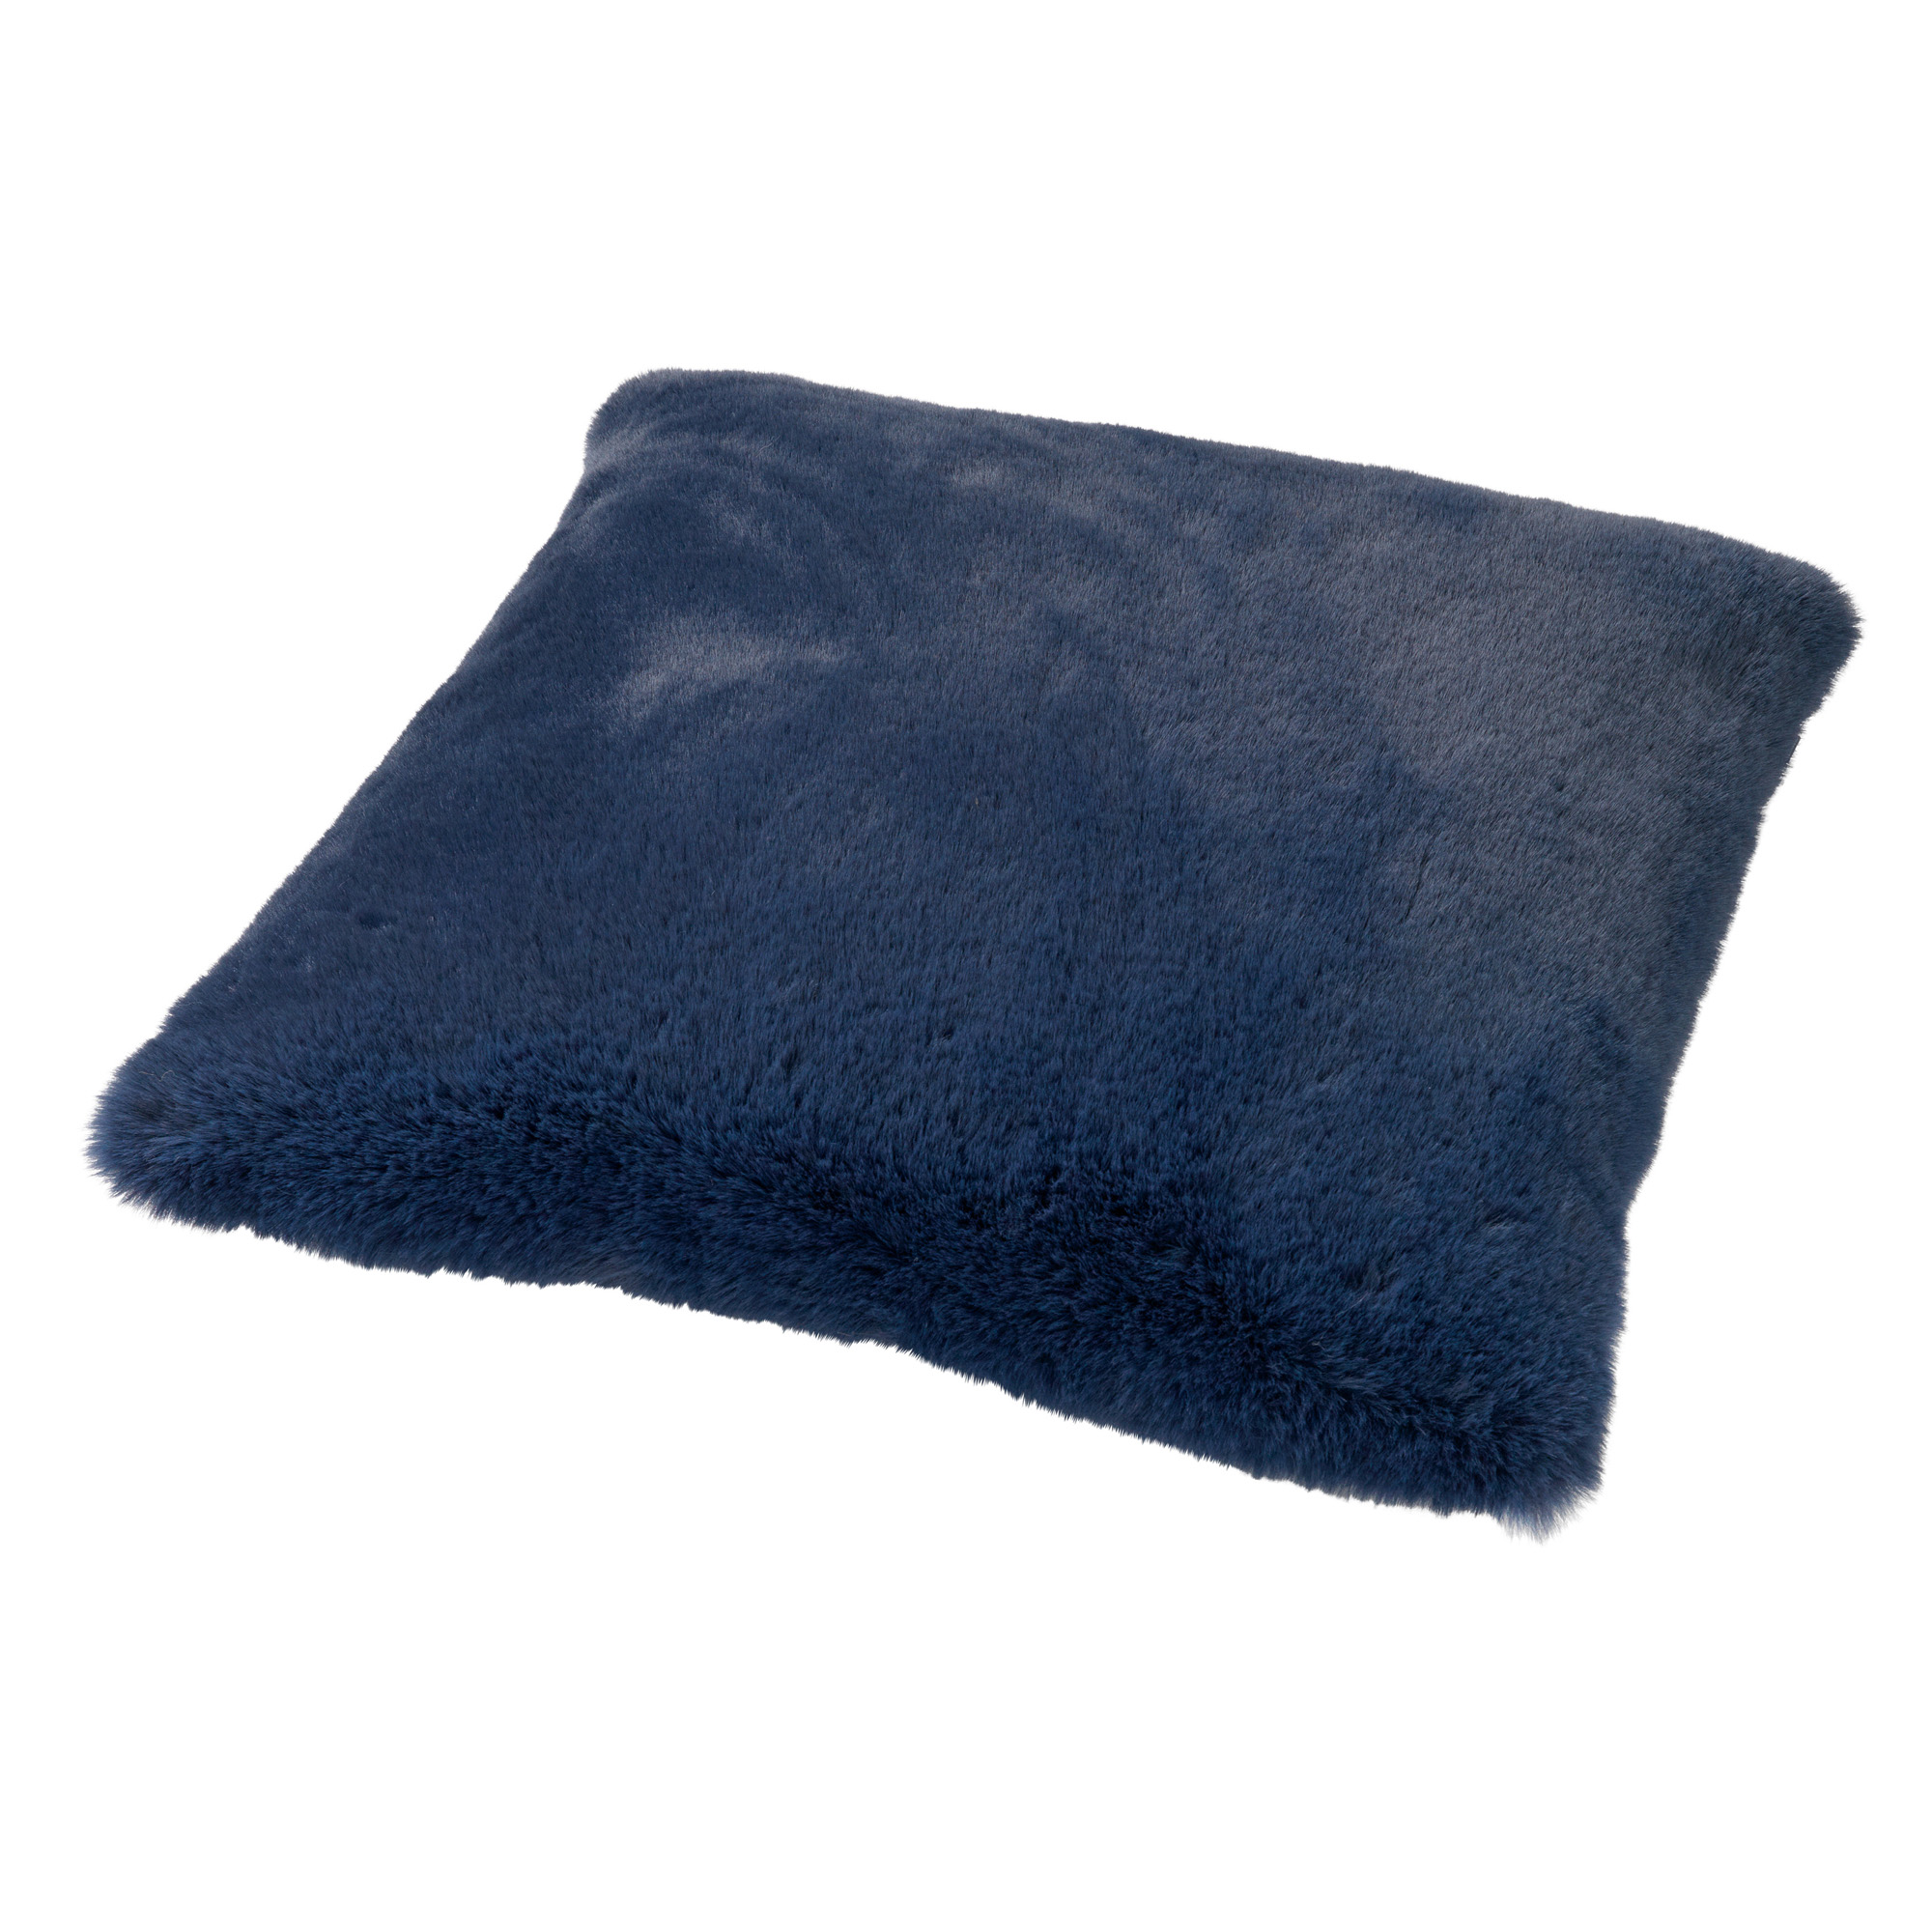 ZAYA - Sierkussen unikleur Insignia Blue 45x45 cm